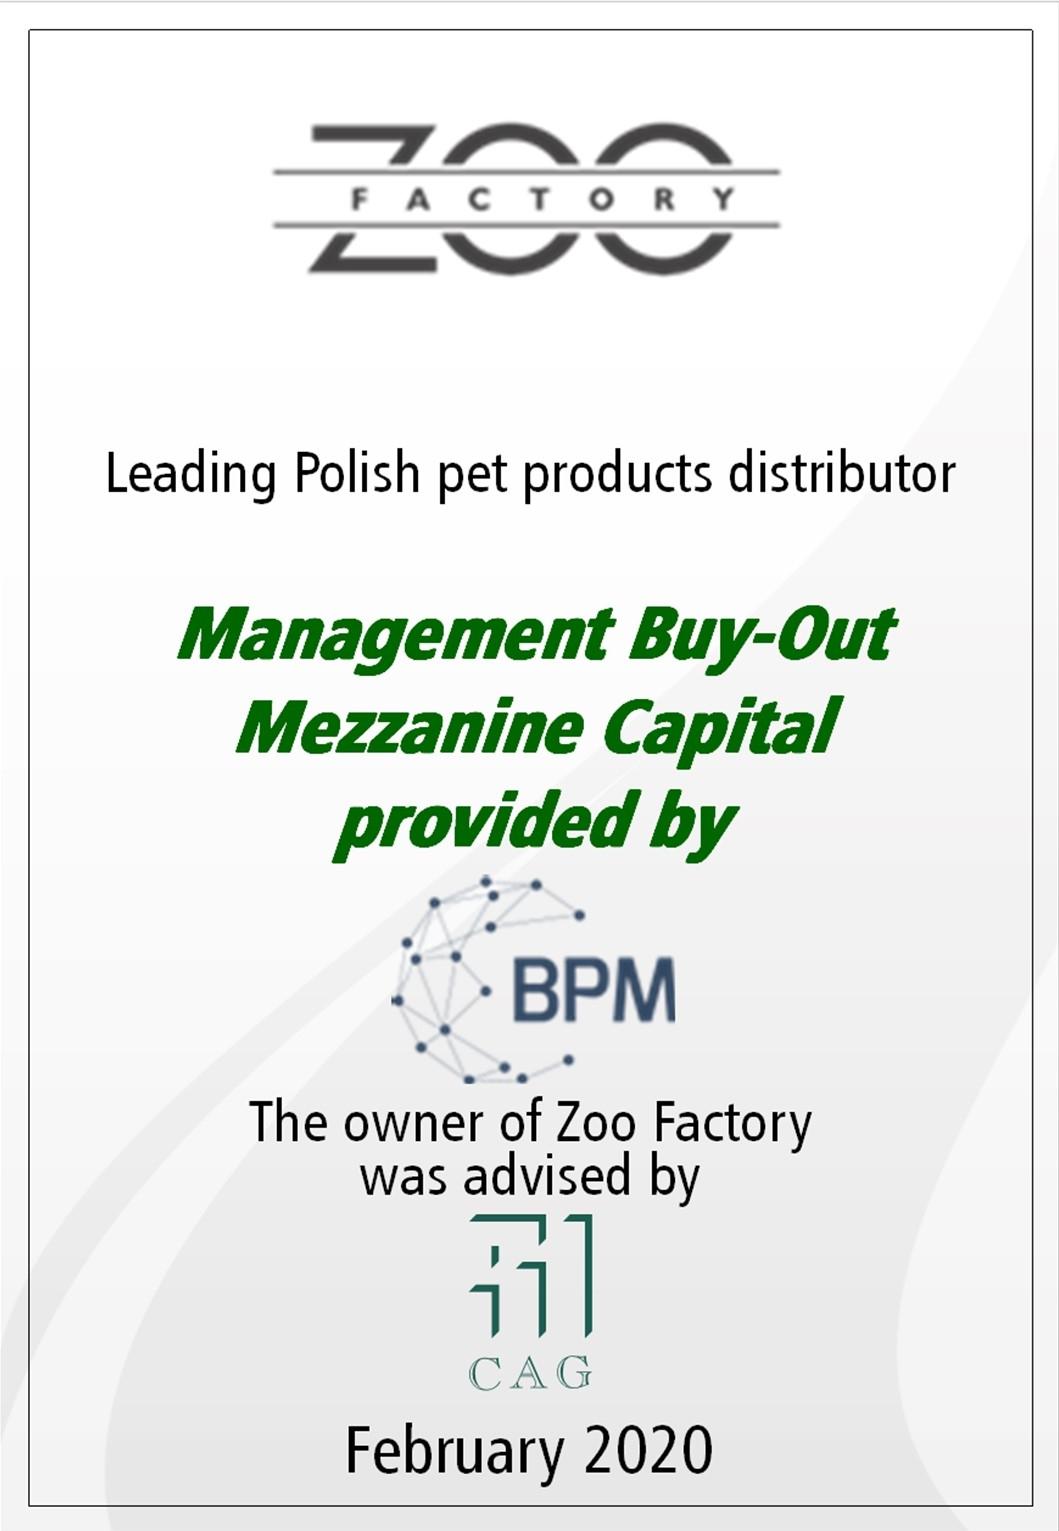 ZOO Factory